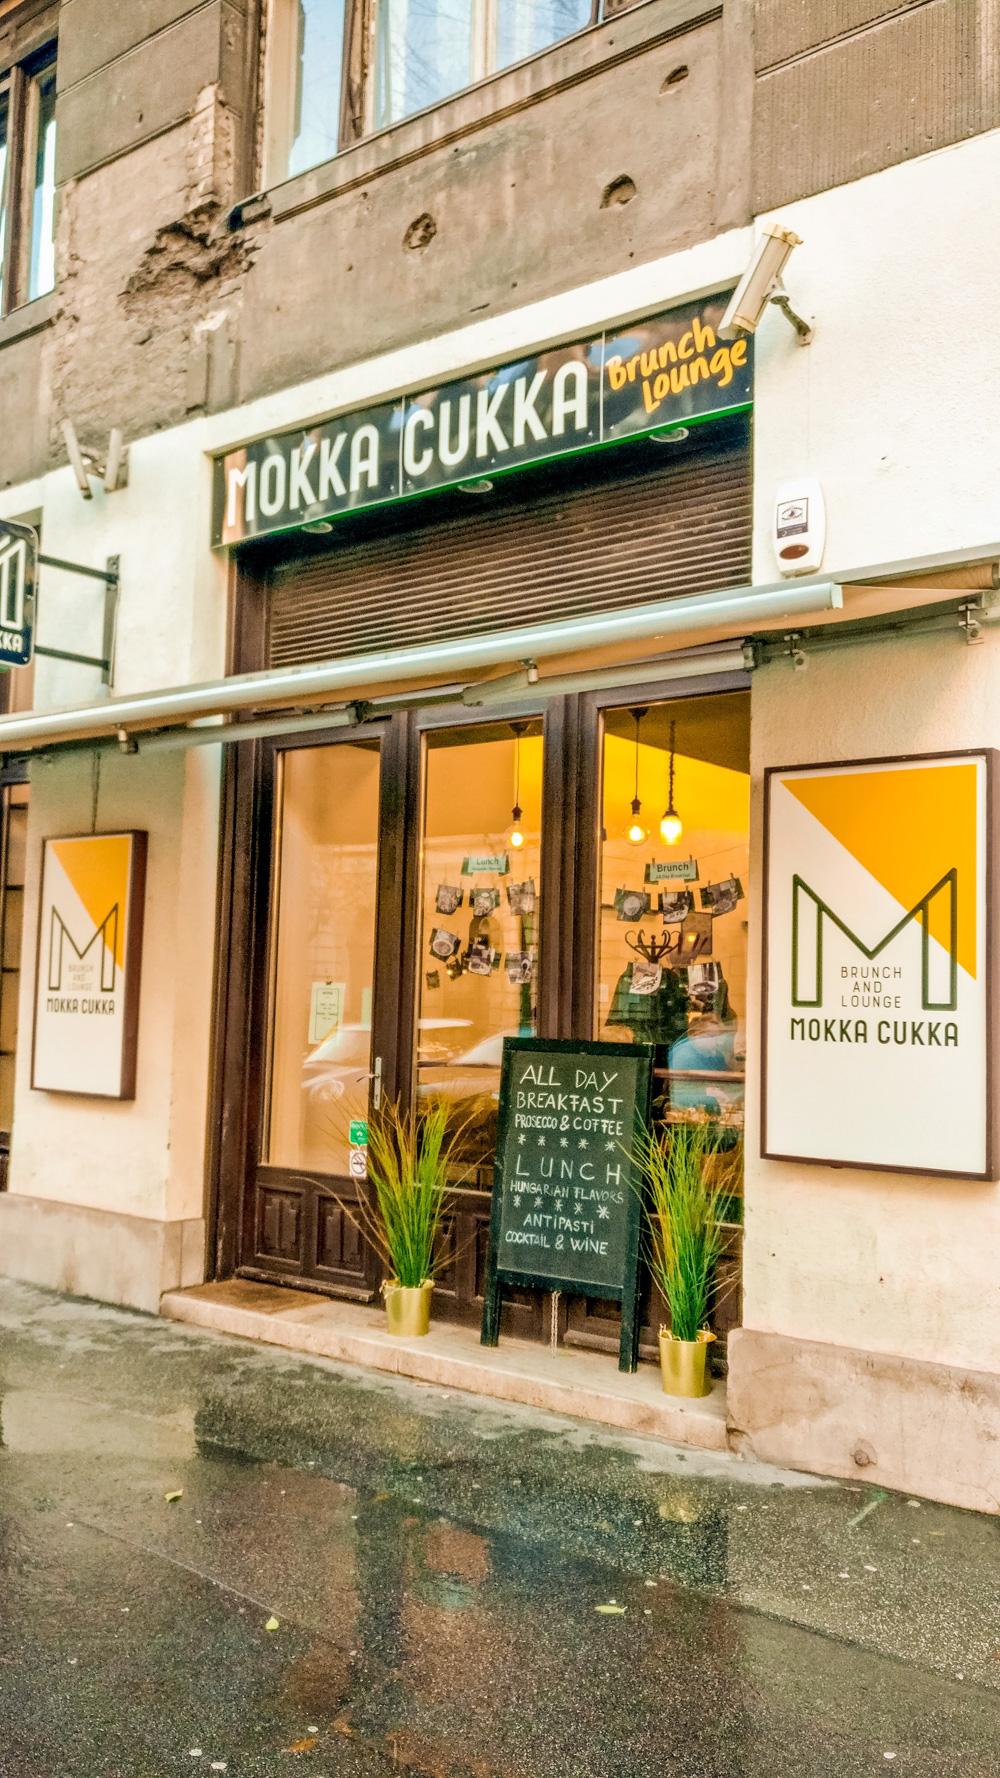 Mokka Cukka - Budapest's best breakfast & brunch places close to the Parliament | Aliz's Wonderland